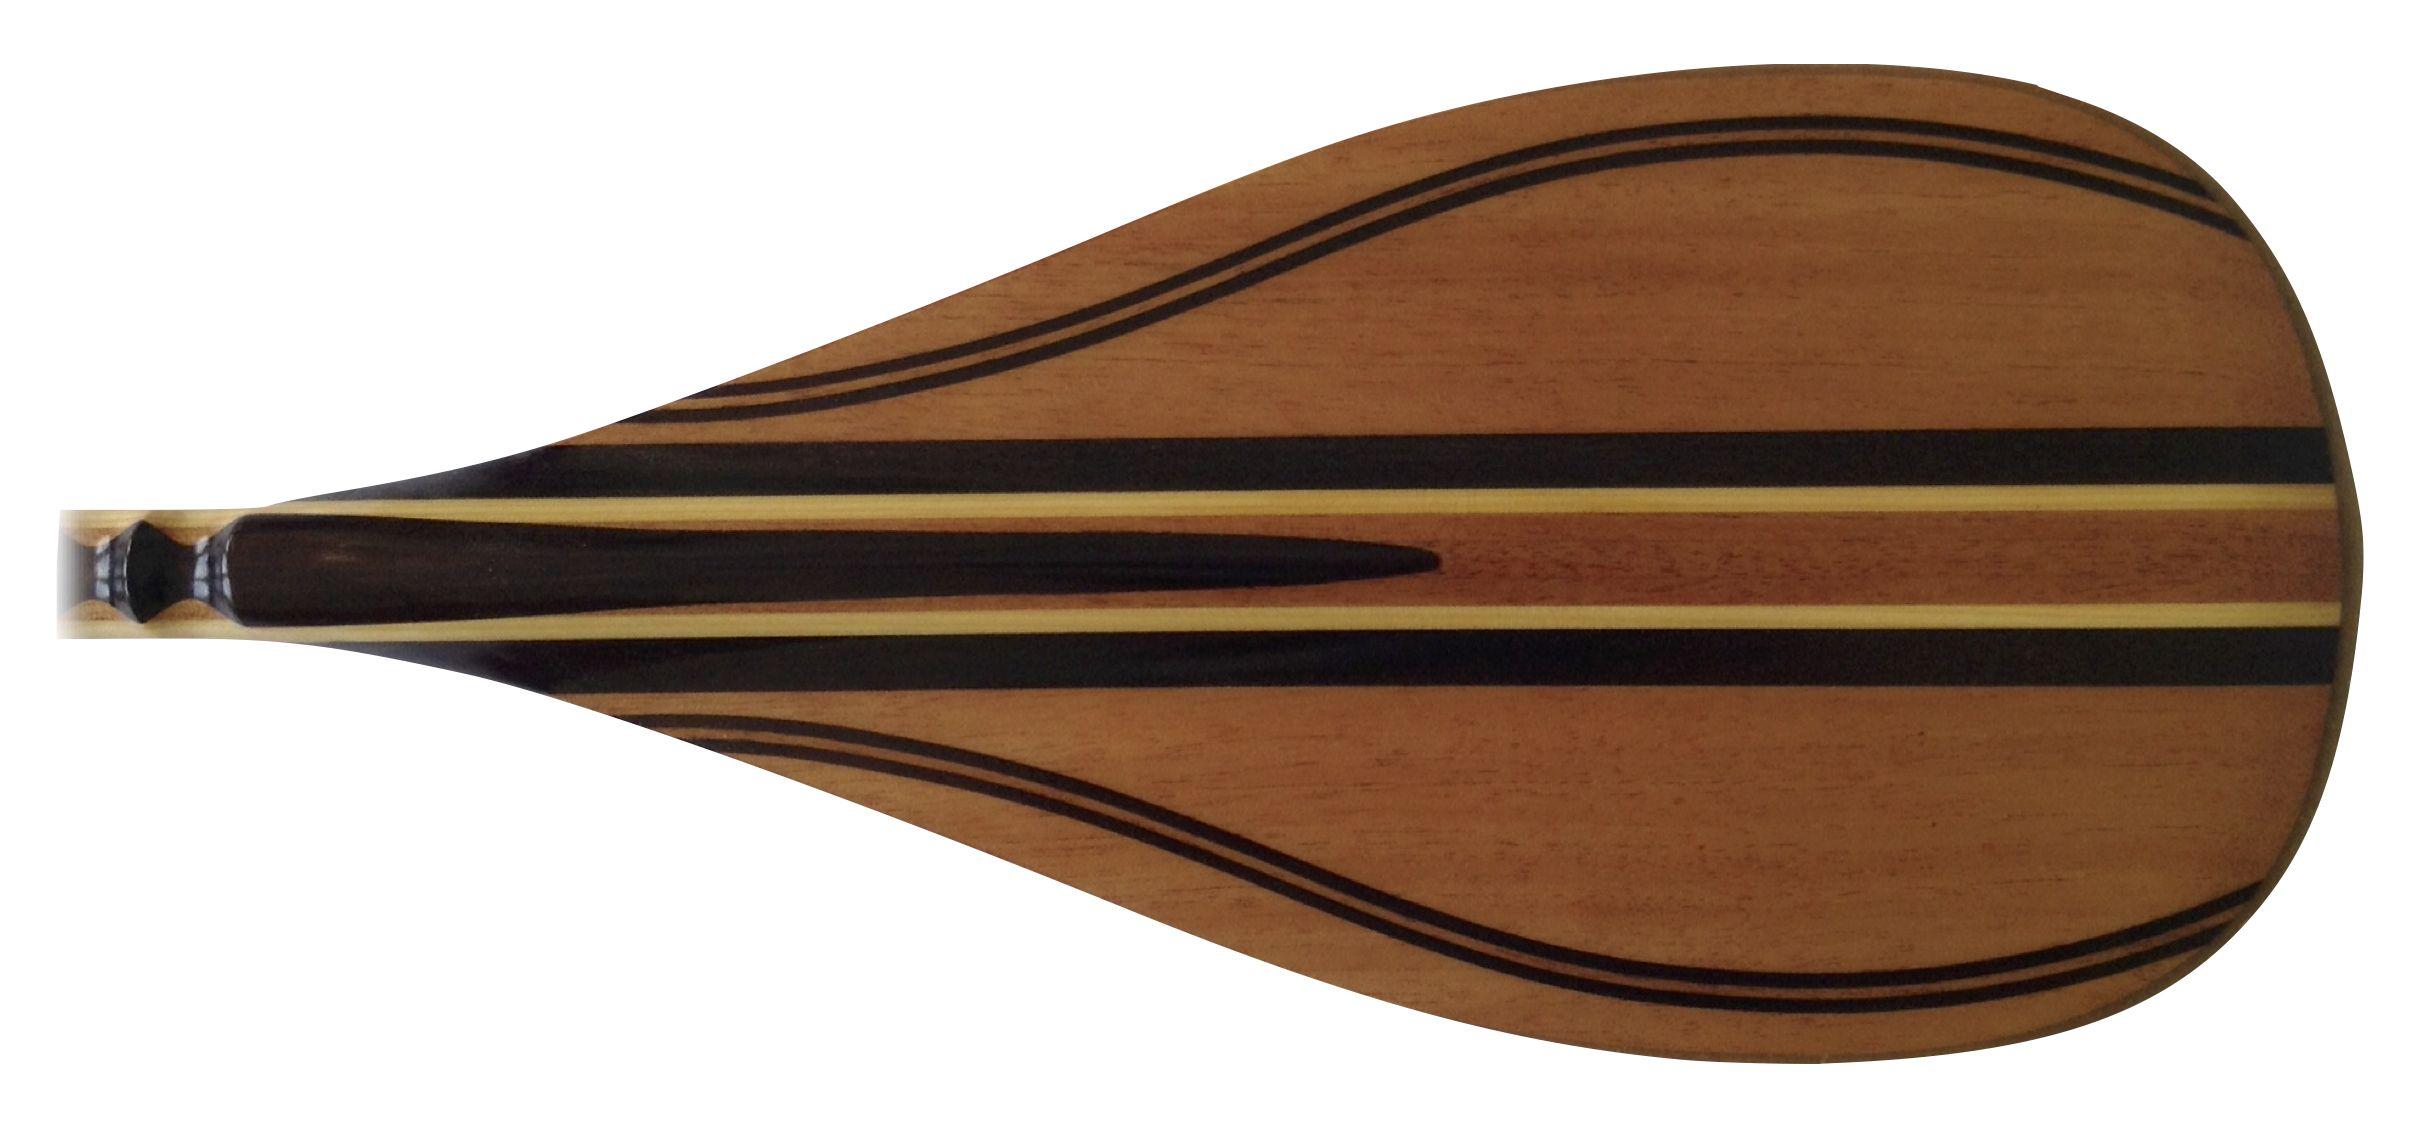 Deppen custom wood canoe paddles - Our New Pili Canoe Paddle